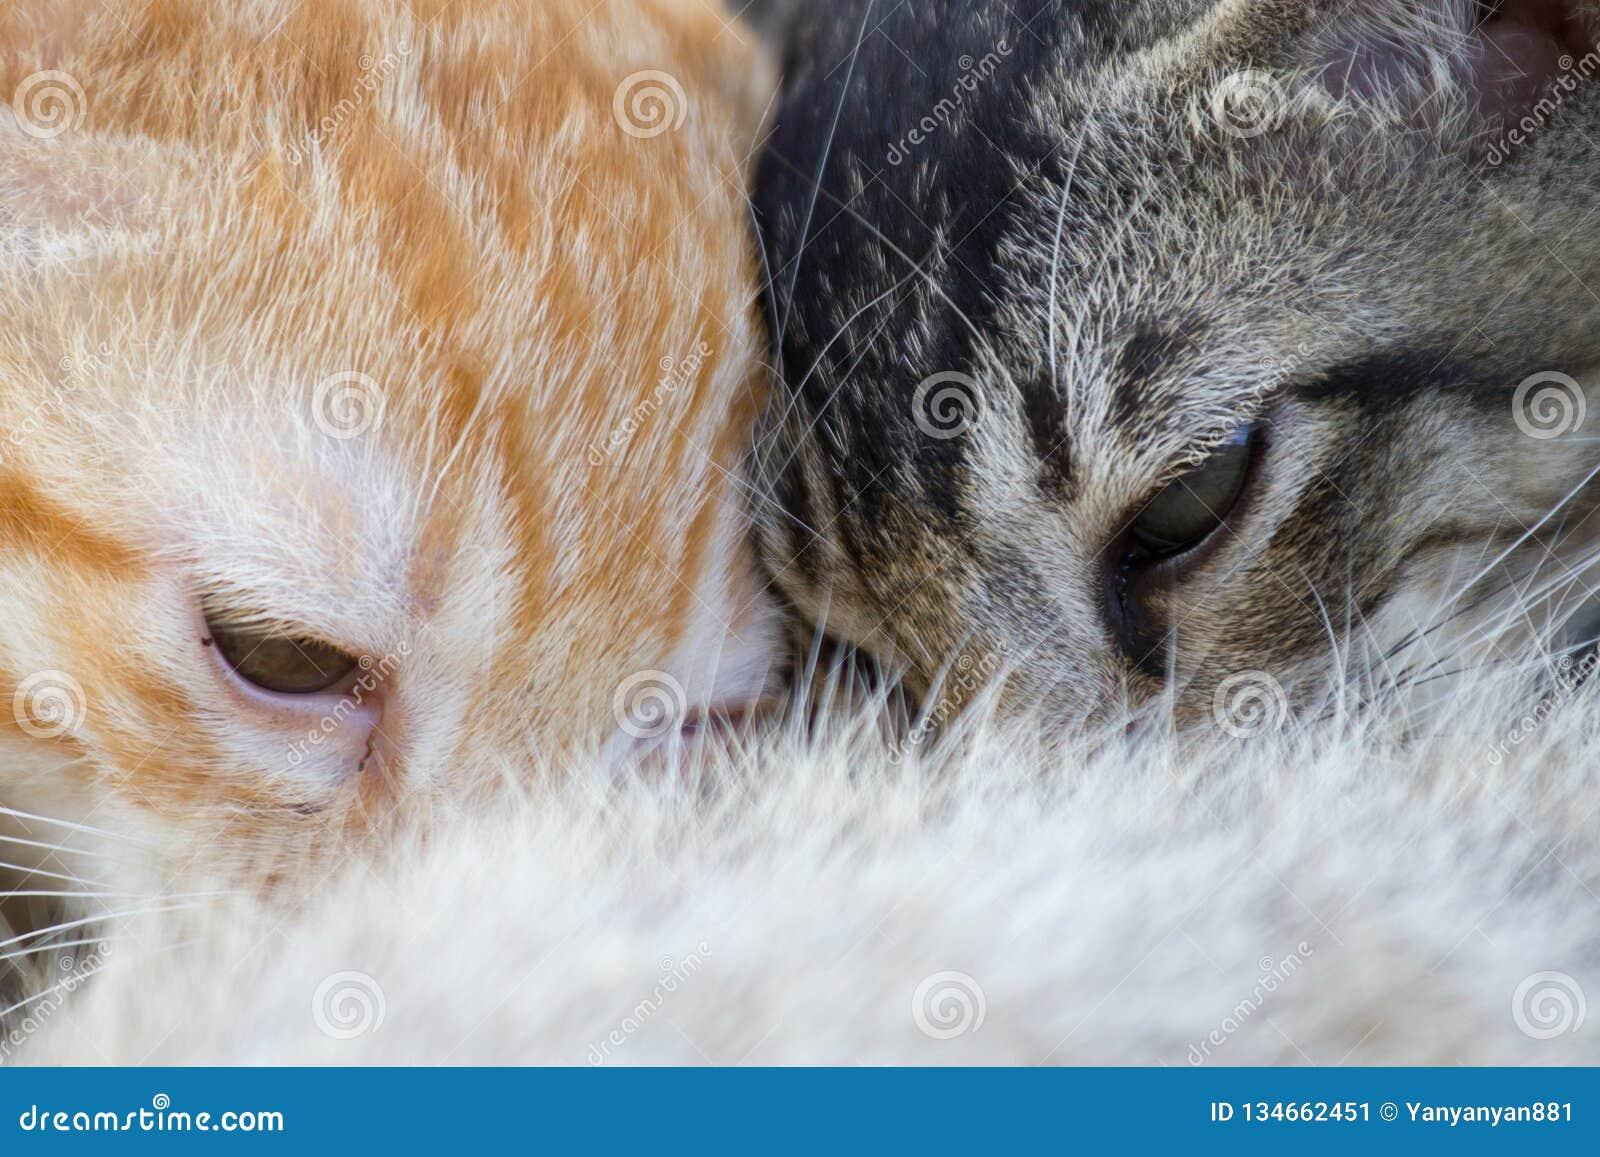 Newborn kittens drink milk from mother`s breast